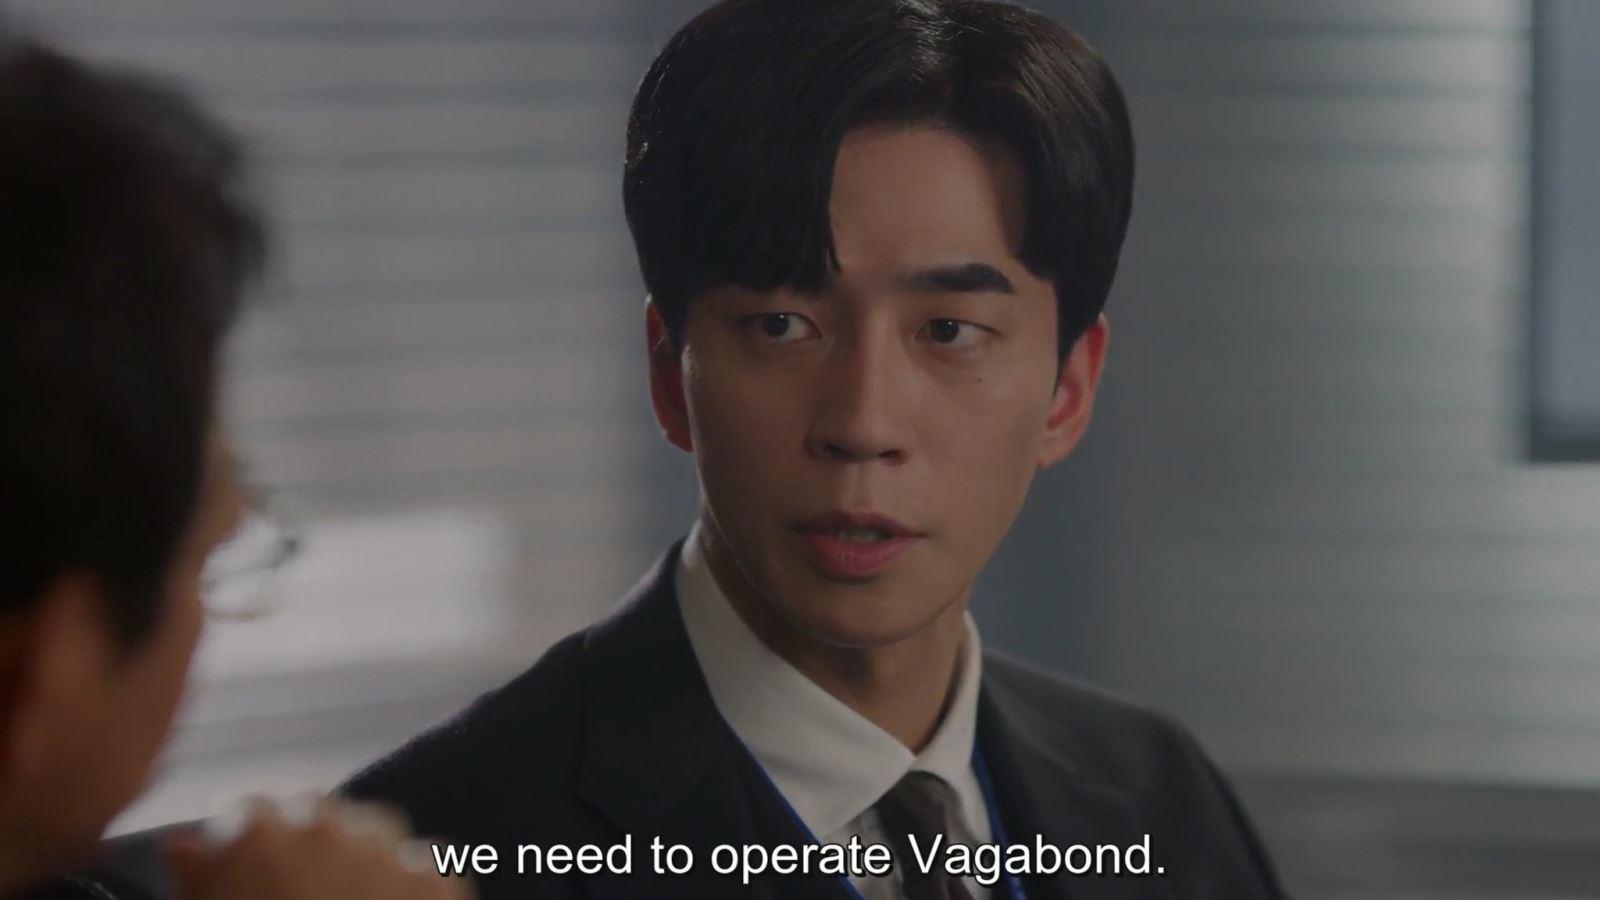 Tập 15 Vagabond, xem tập 15 Vagabond, Vagabond tập 15, Vagabond, Lãng khách, Lãng khách tâp 15, xem Lang khach, Lang khach tap 15, Lee Seung Gi, Suzy, thủ tướng